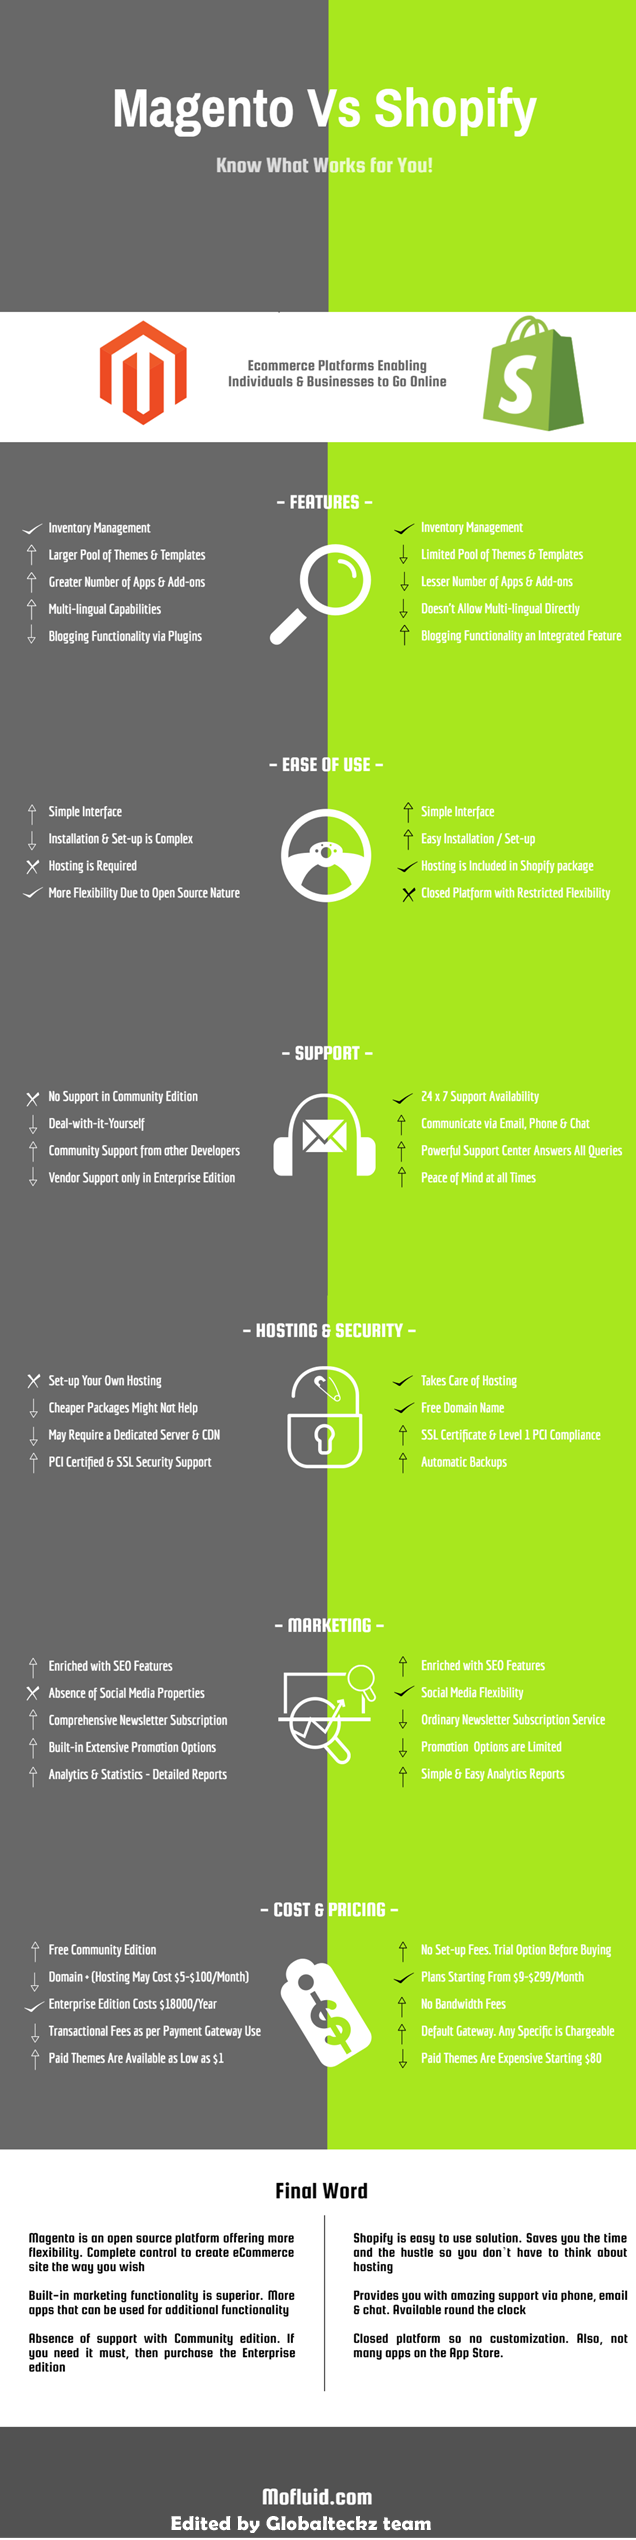 magento vs shopify, magento and shopify,